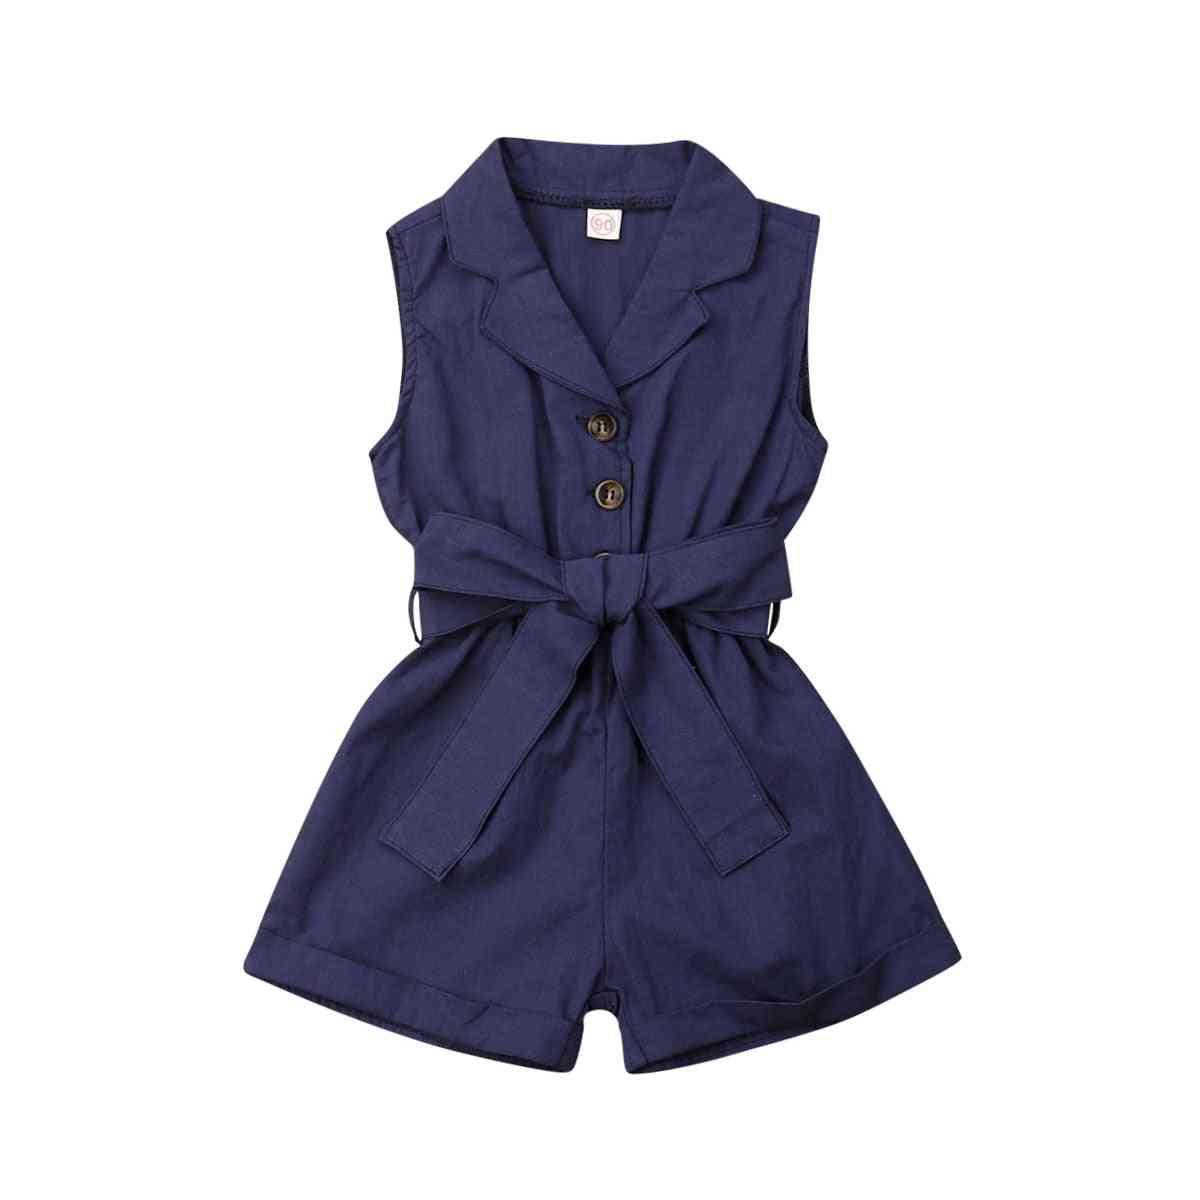 Summer Baby Kids Clothes, Bow-tie Waist Romper/ Bodysuit/jumpsuit Outfits Shorts